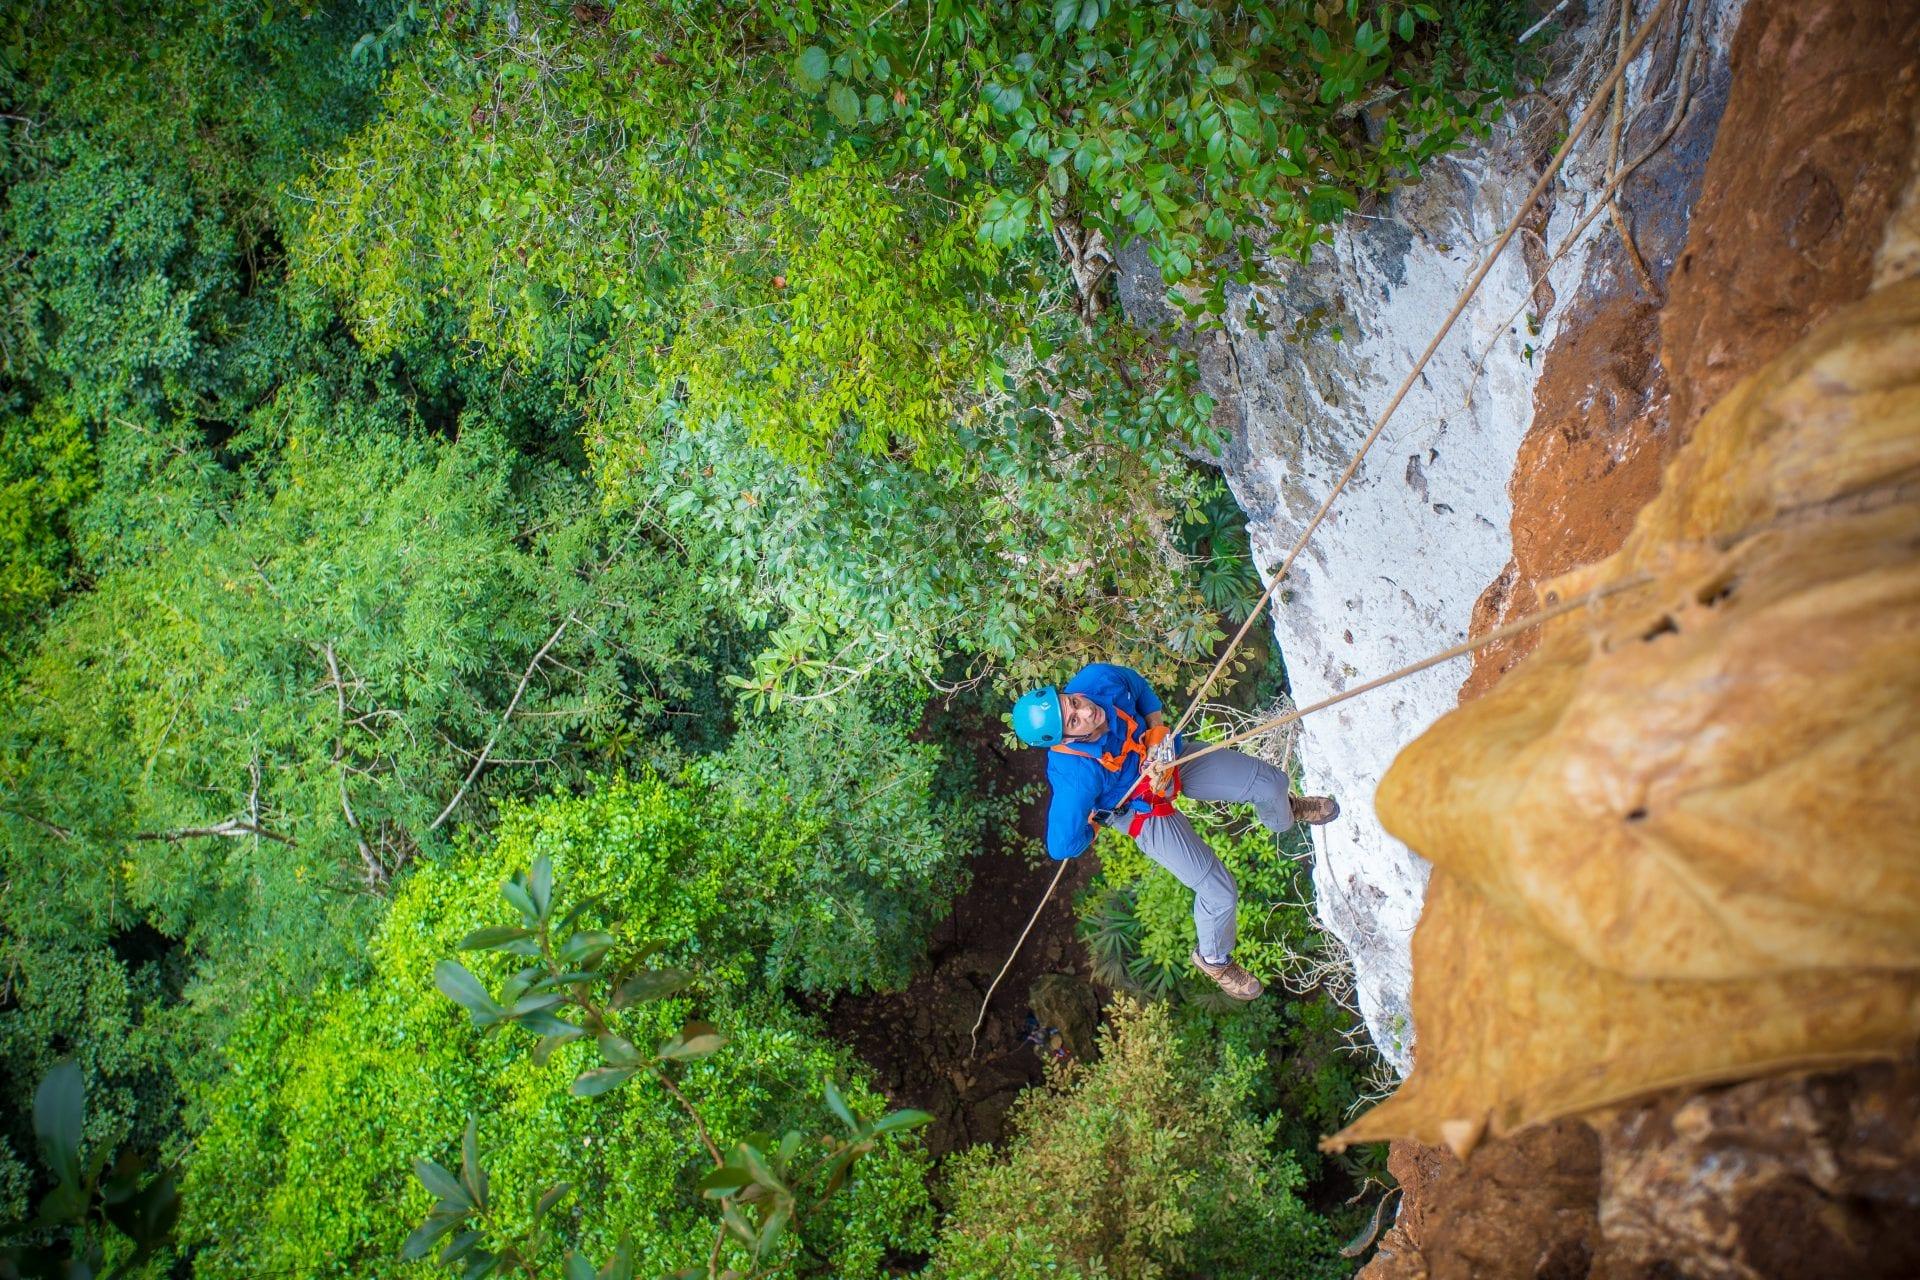 Belize's Black Hole Drop at Caves Branch Jungle Lodge.